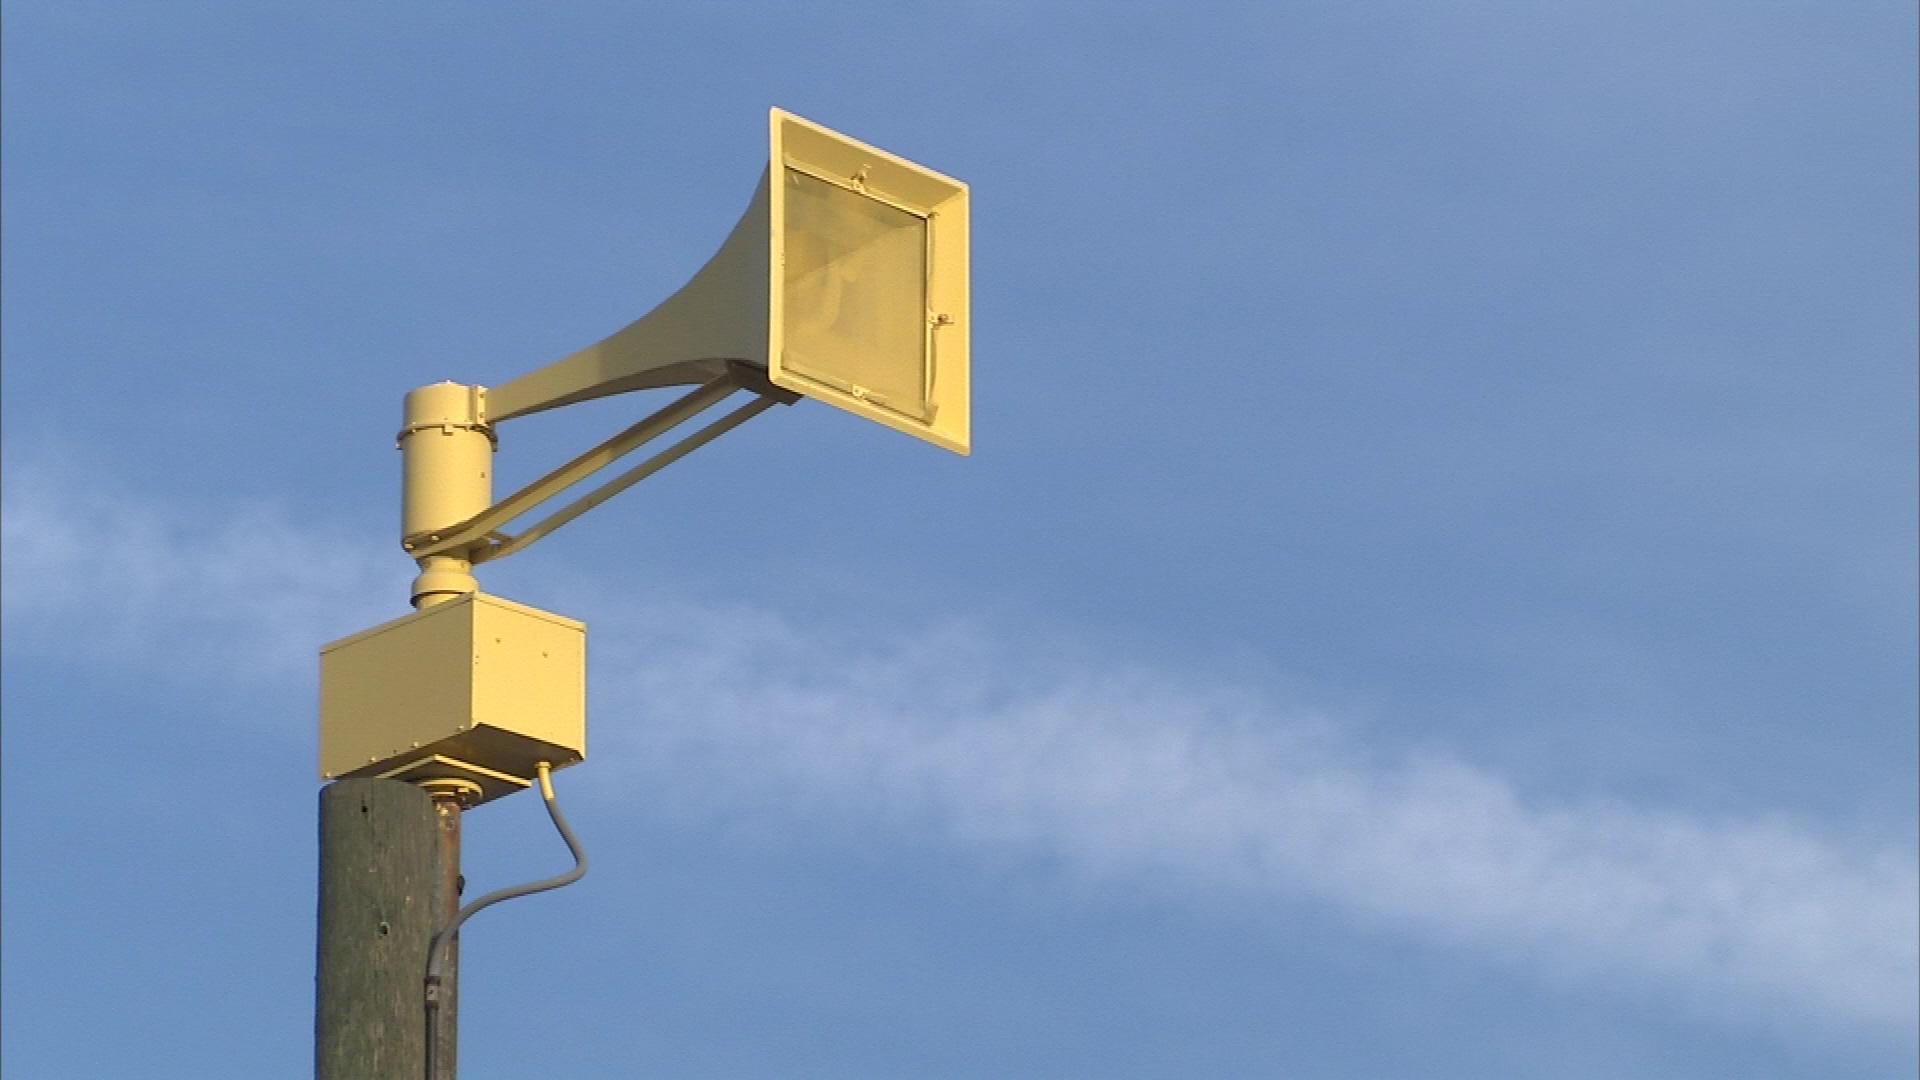 New Tornado Siren System For Nashville Major Topic At City